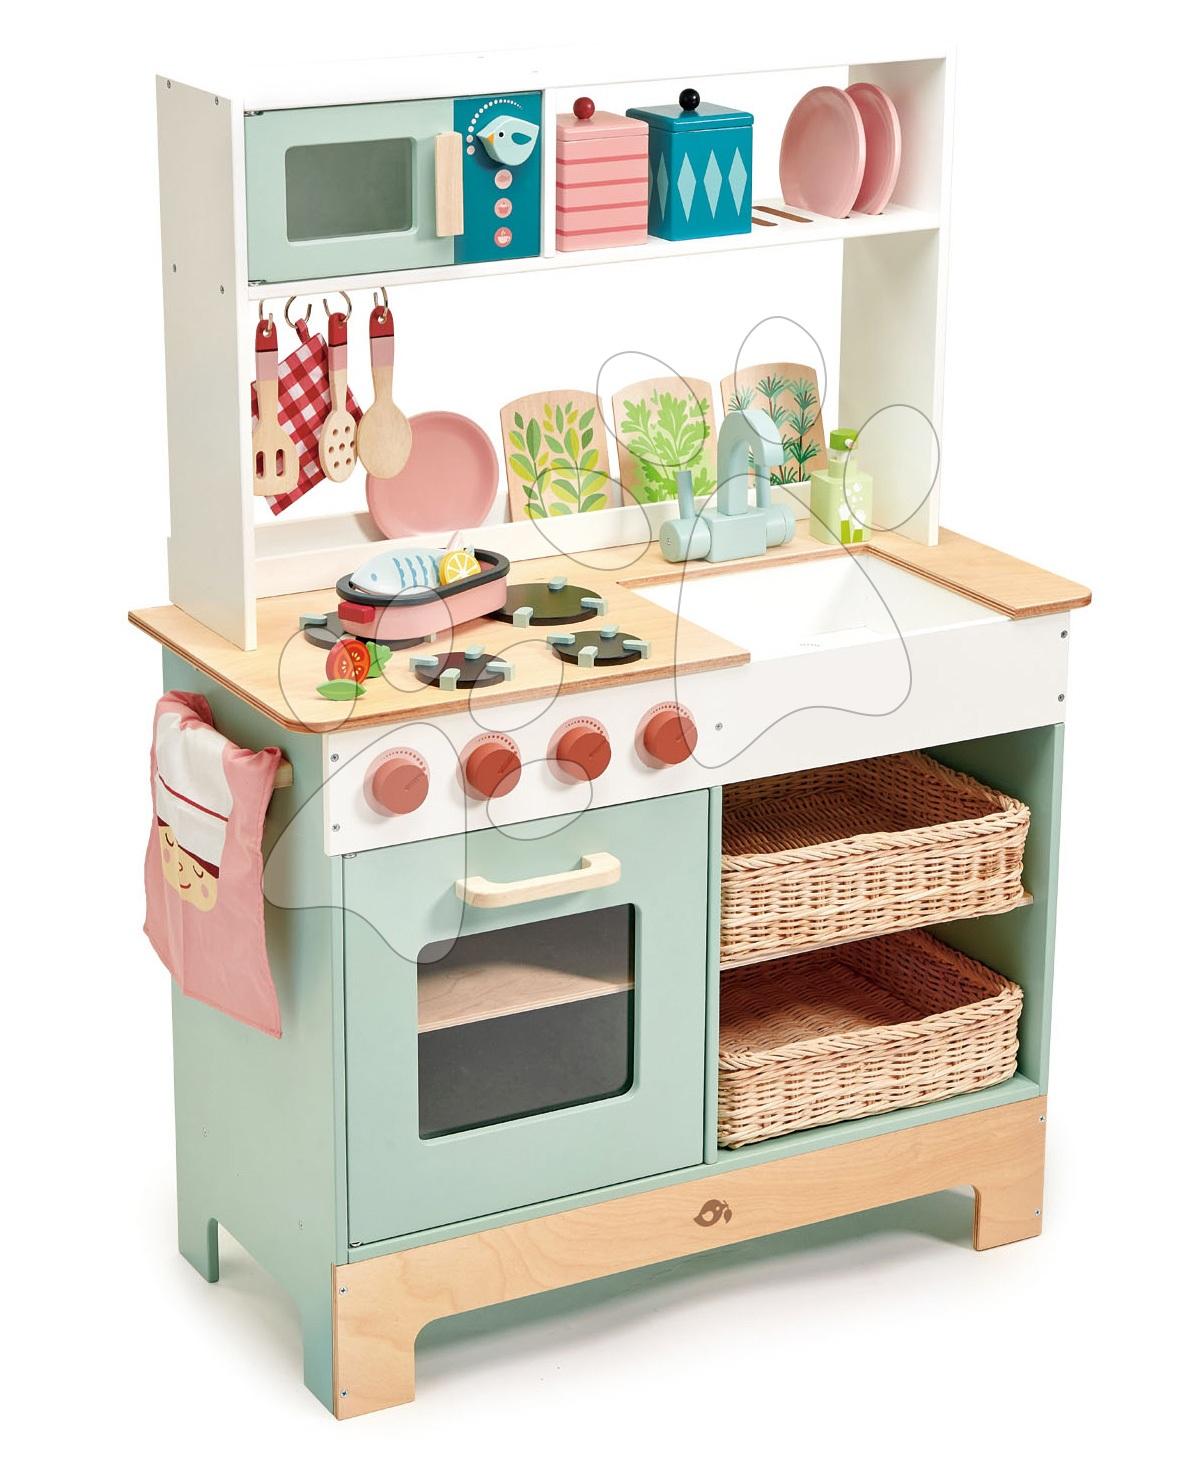 Drevená kuchynka s bylinkami Kitchen Range Tender Leaf Toys s magnetickou rybou, mikrovlnka a sporák so zvukmi